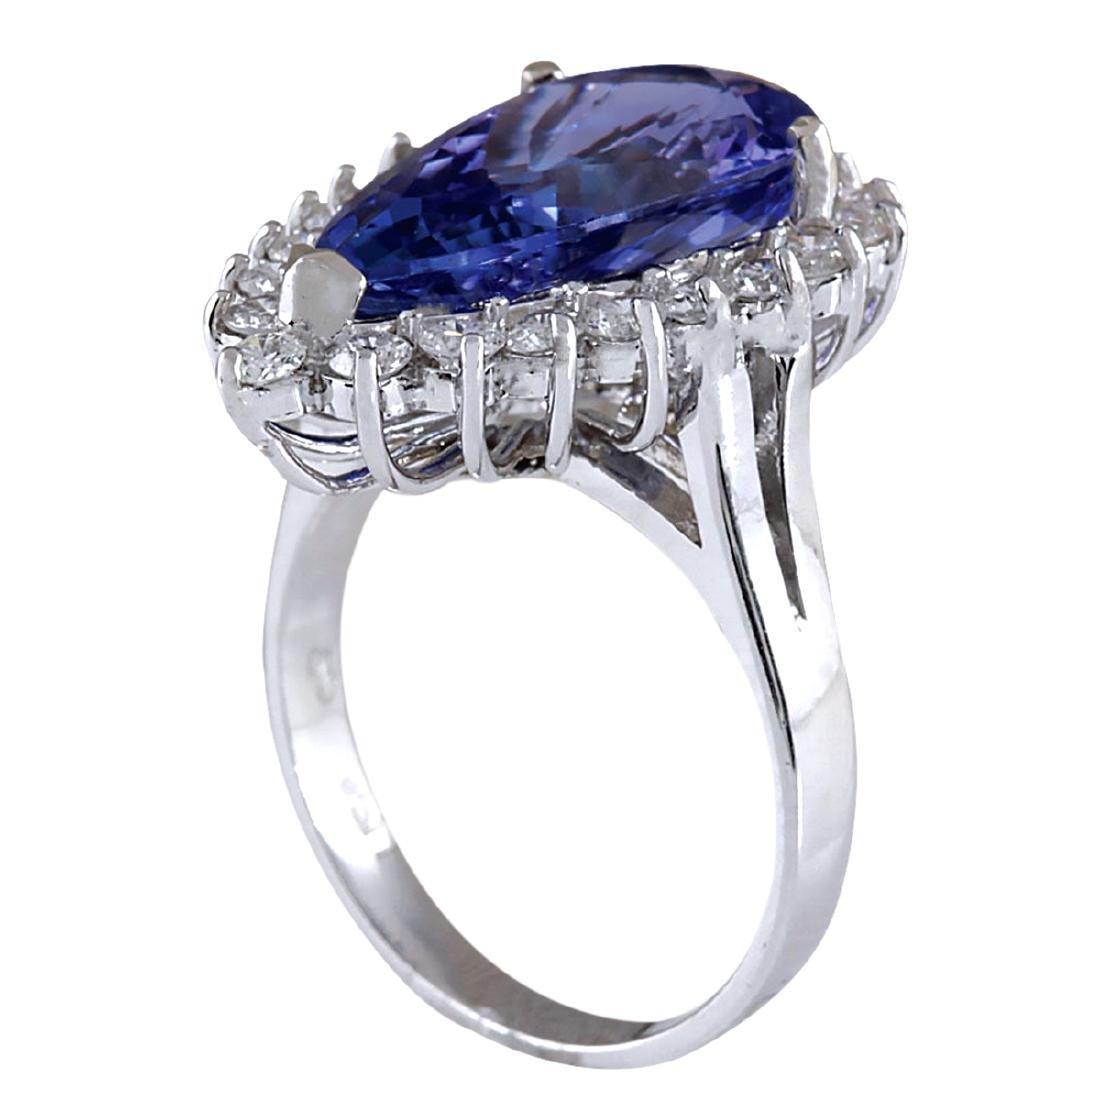 7.26CTW Natural Tanzanite And Diamond Ring In 18K White - 3